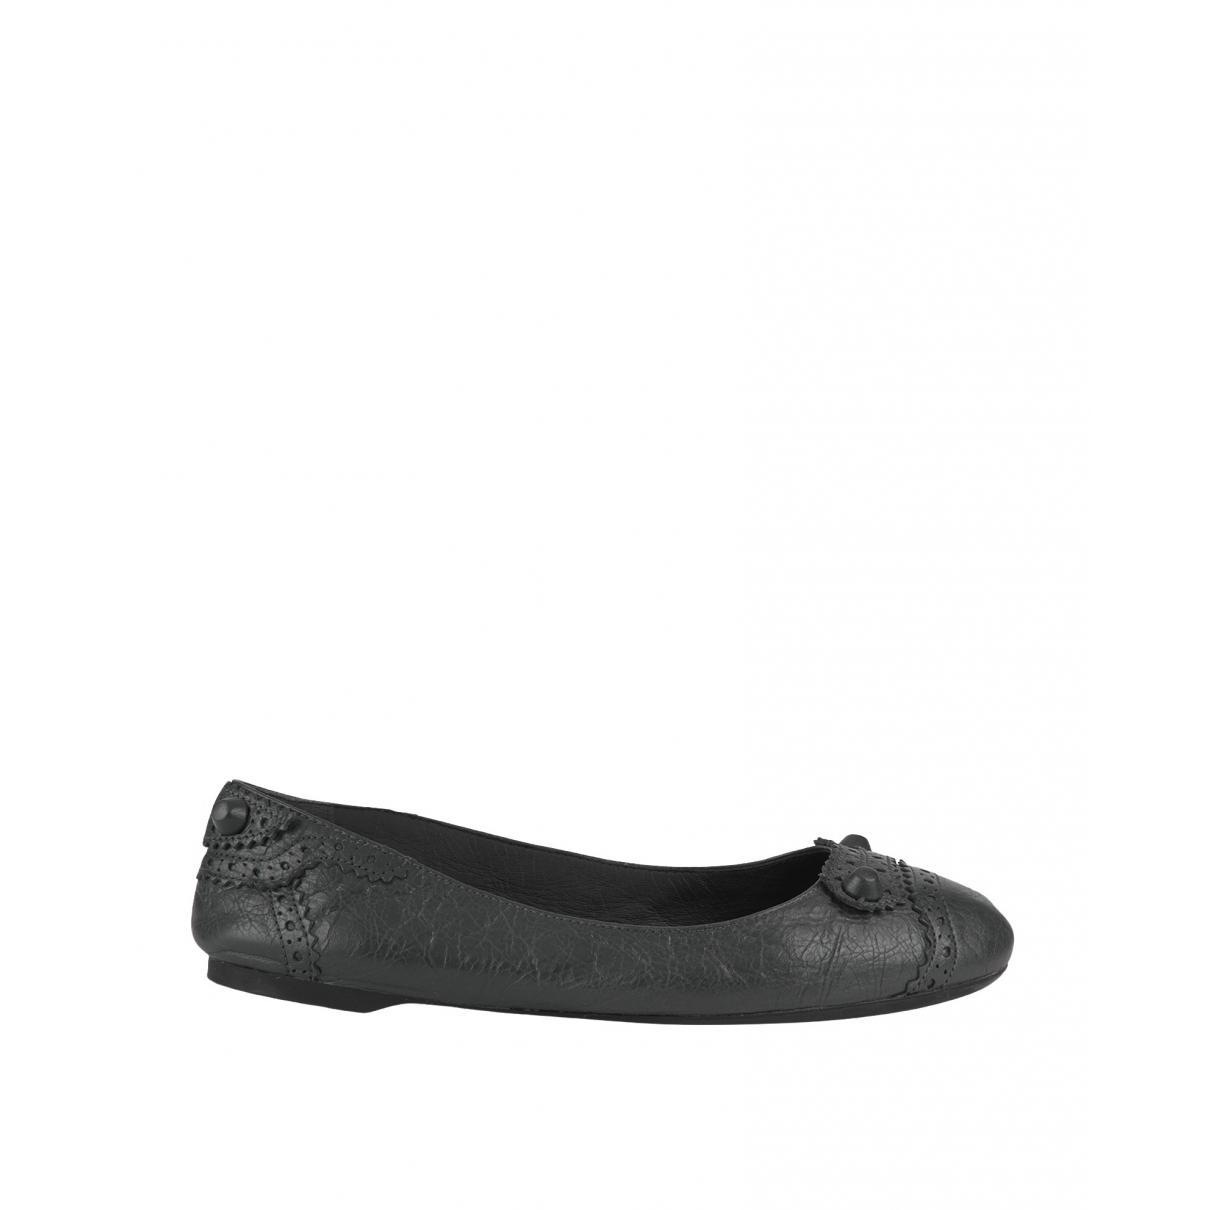 Balenciaga \N Grey Leather Ballet flats for Women 3.5 UK